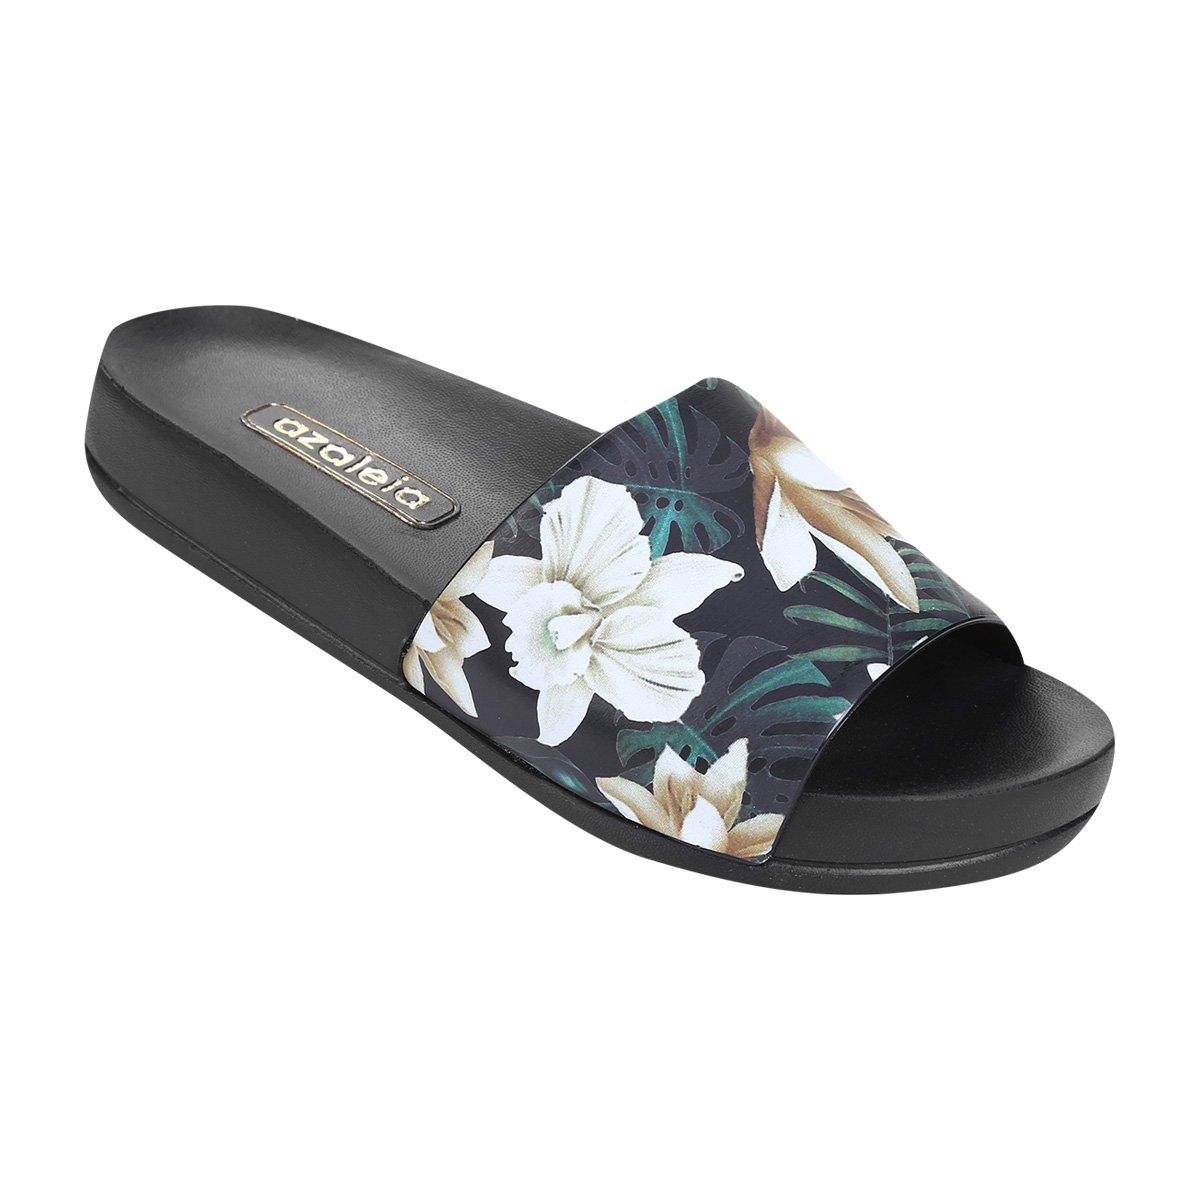 0e25469b03 Chinelo Azaleia Slide Floral Feminino - Preto